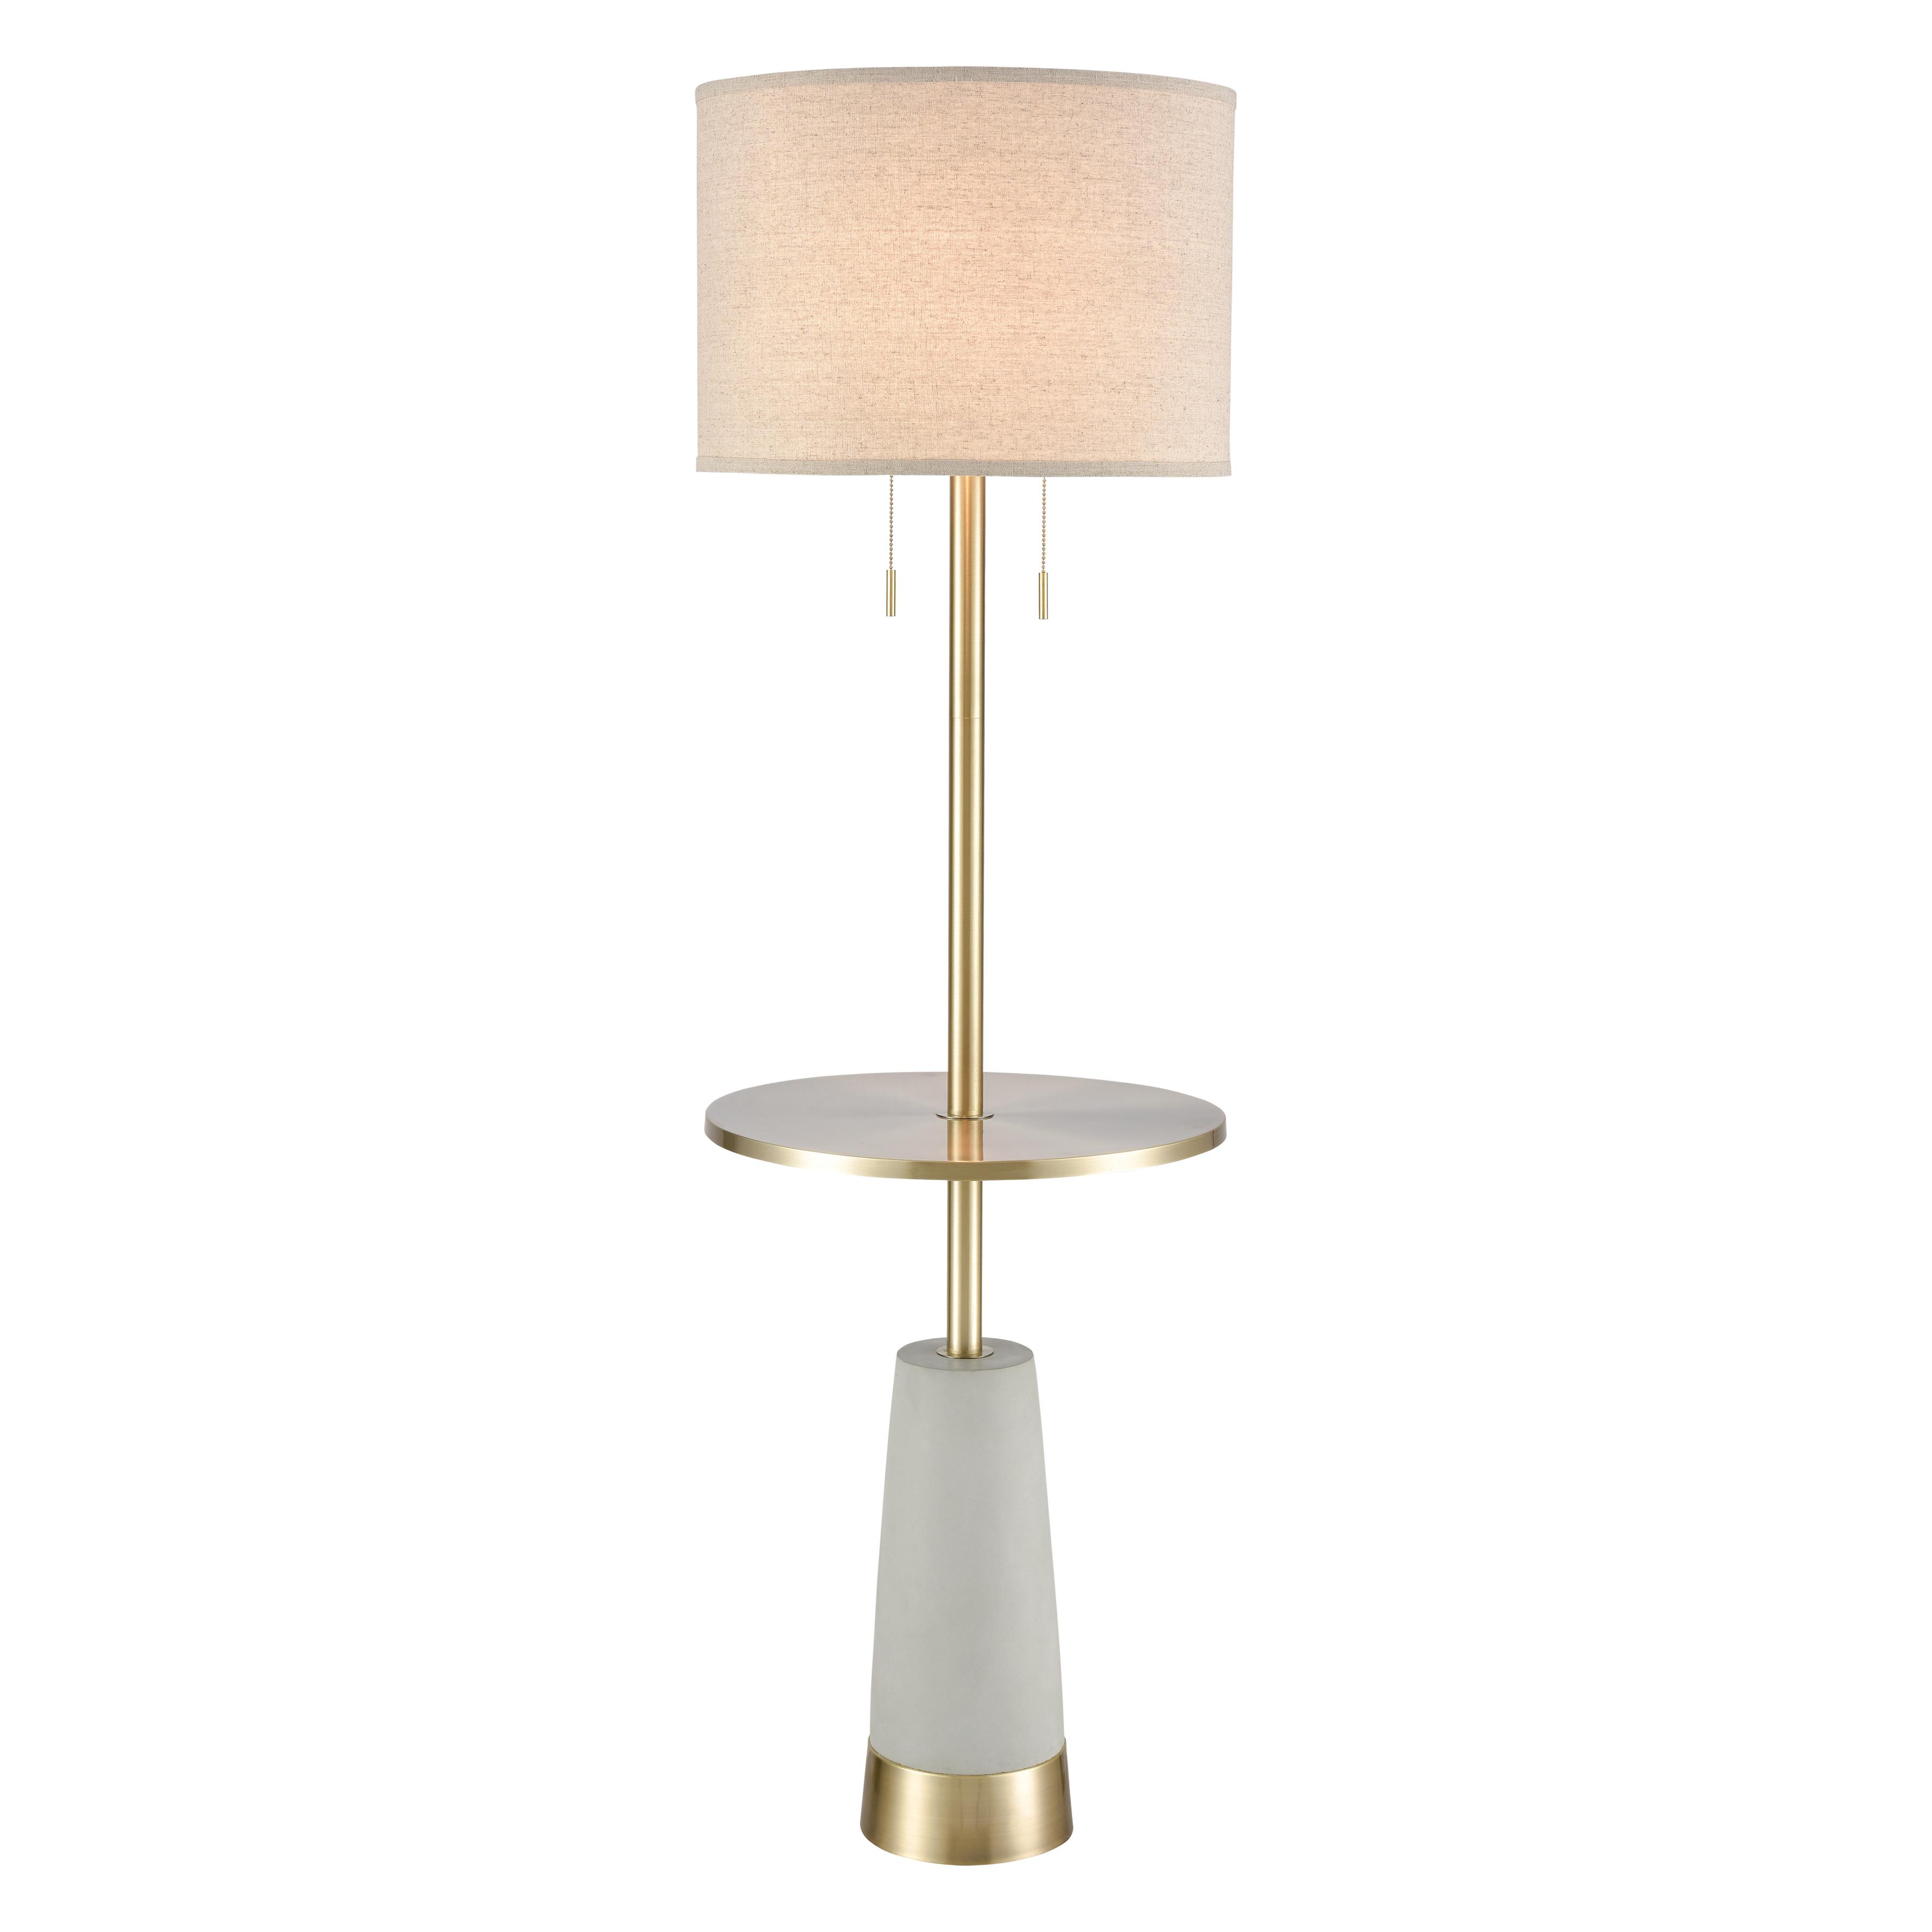 Stein World Below the Surface 2-Light Floor Lamp